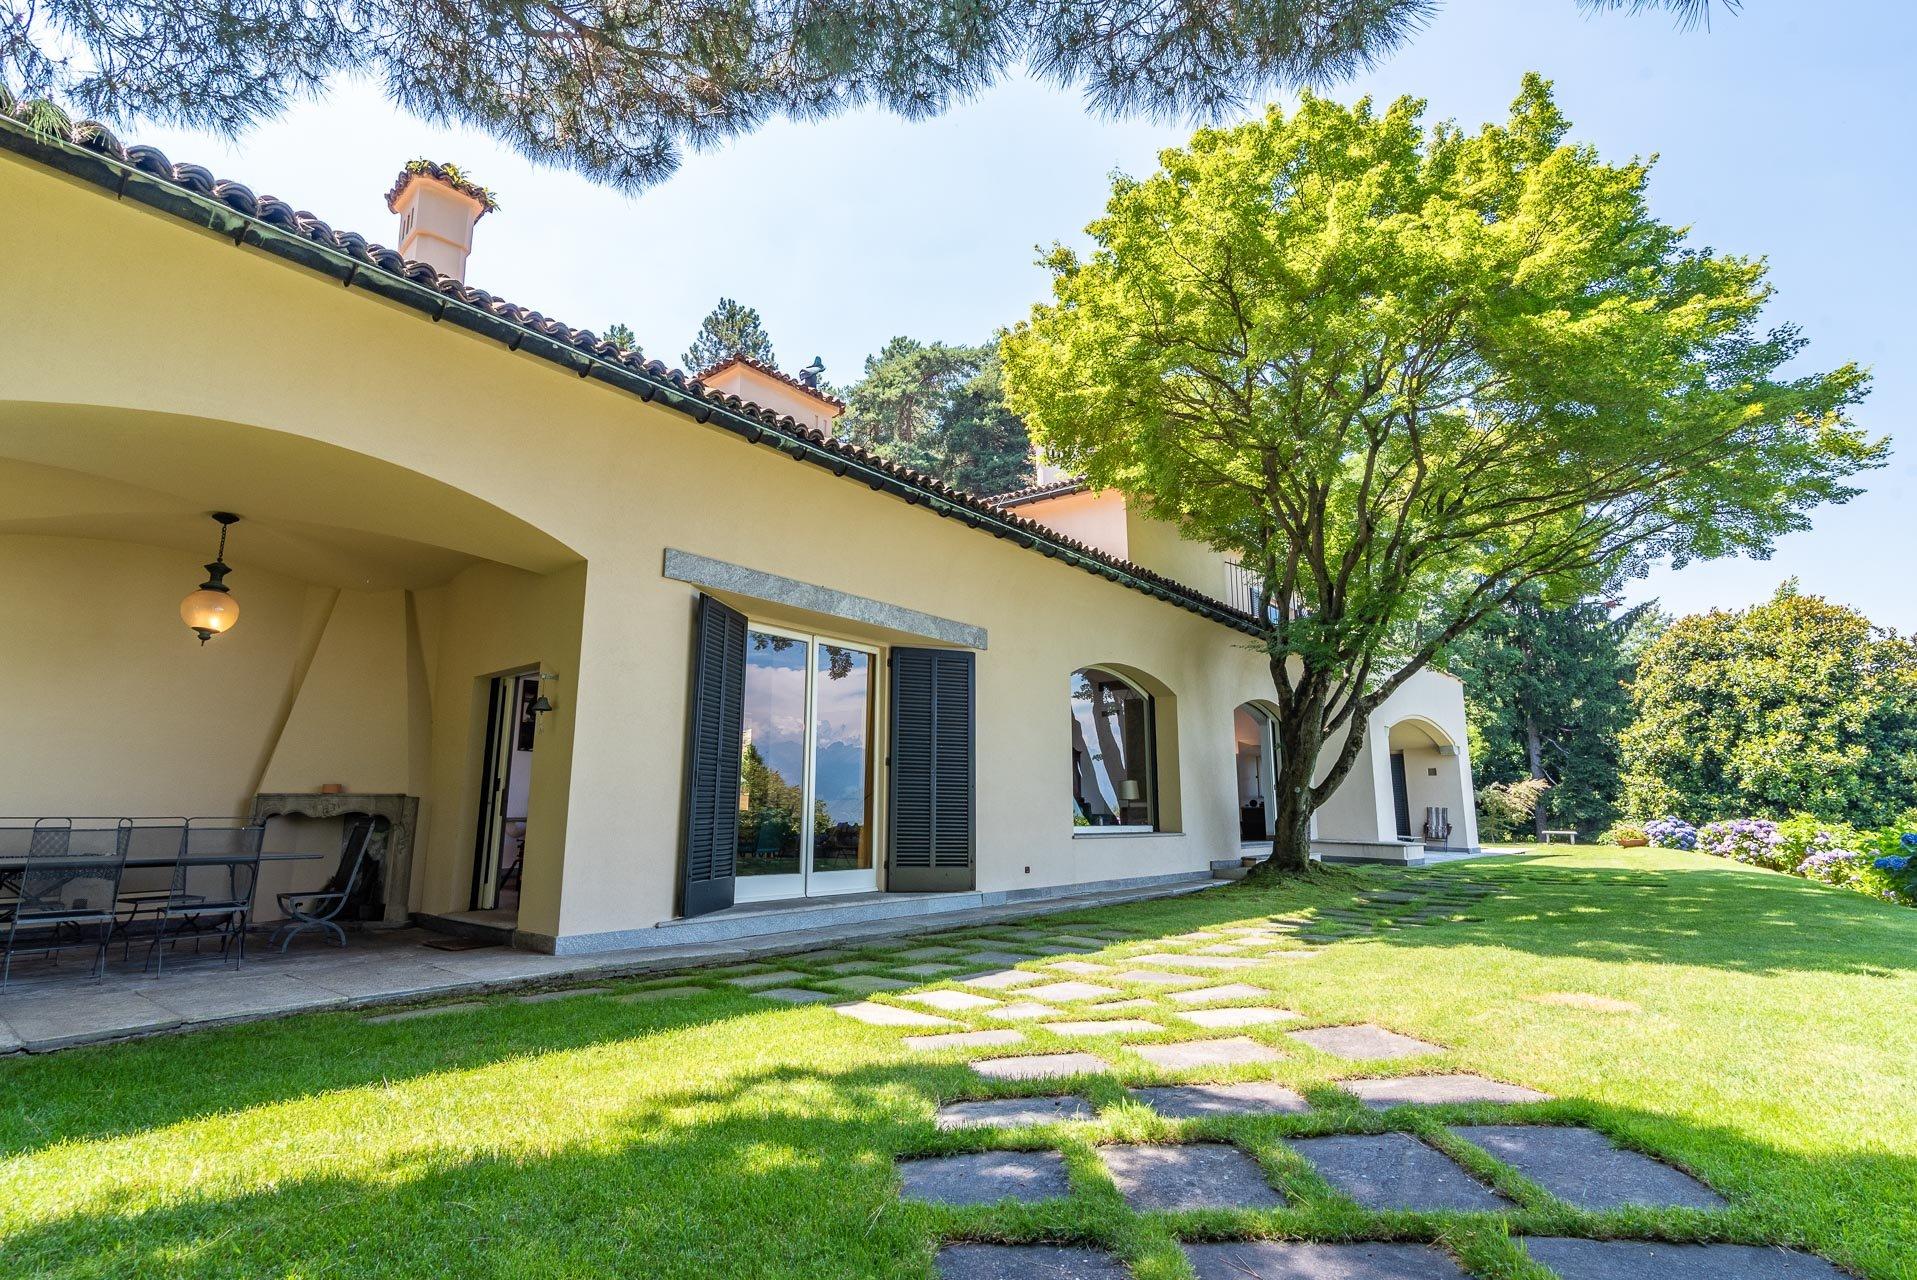 Elegant lake view villa for sale in Stresa - facade